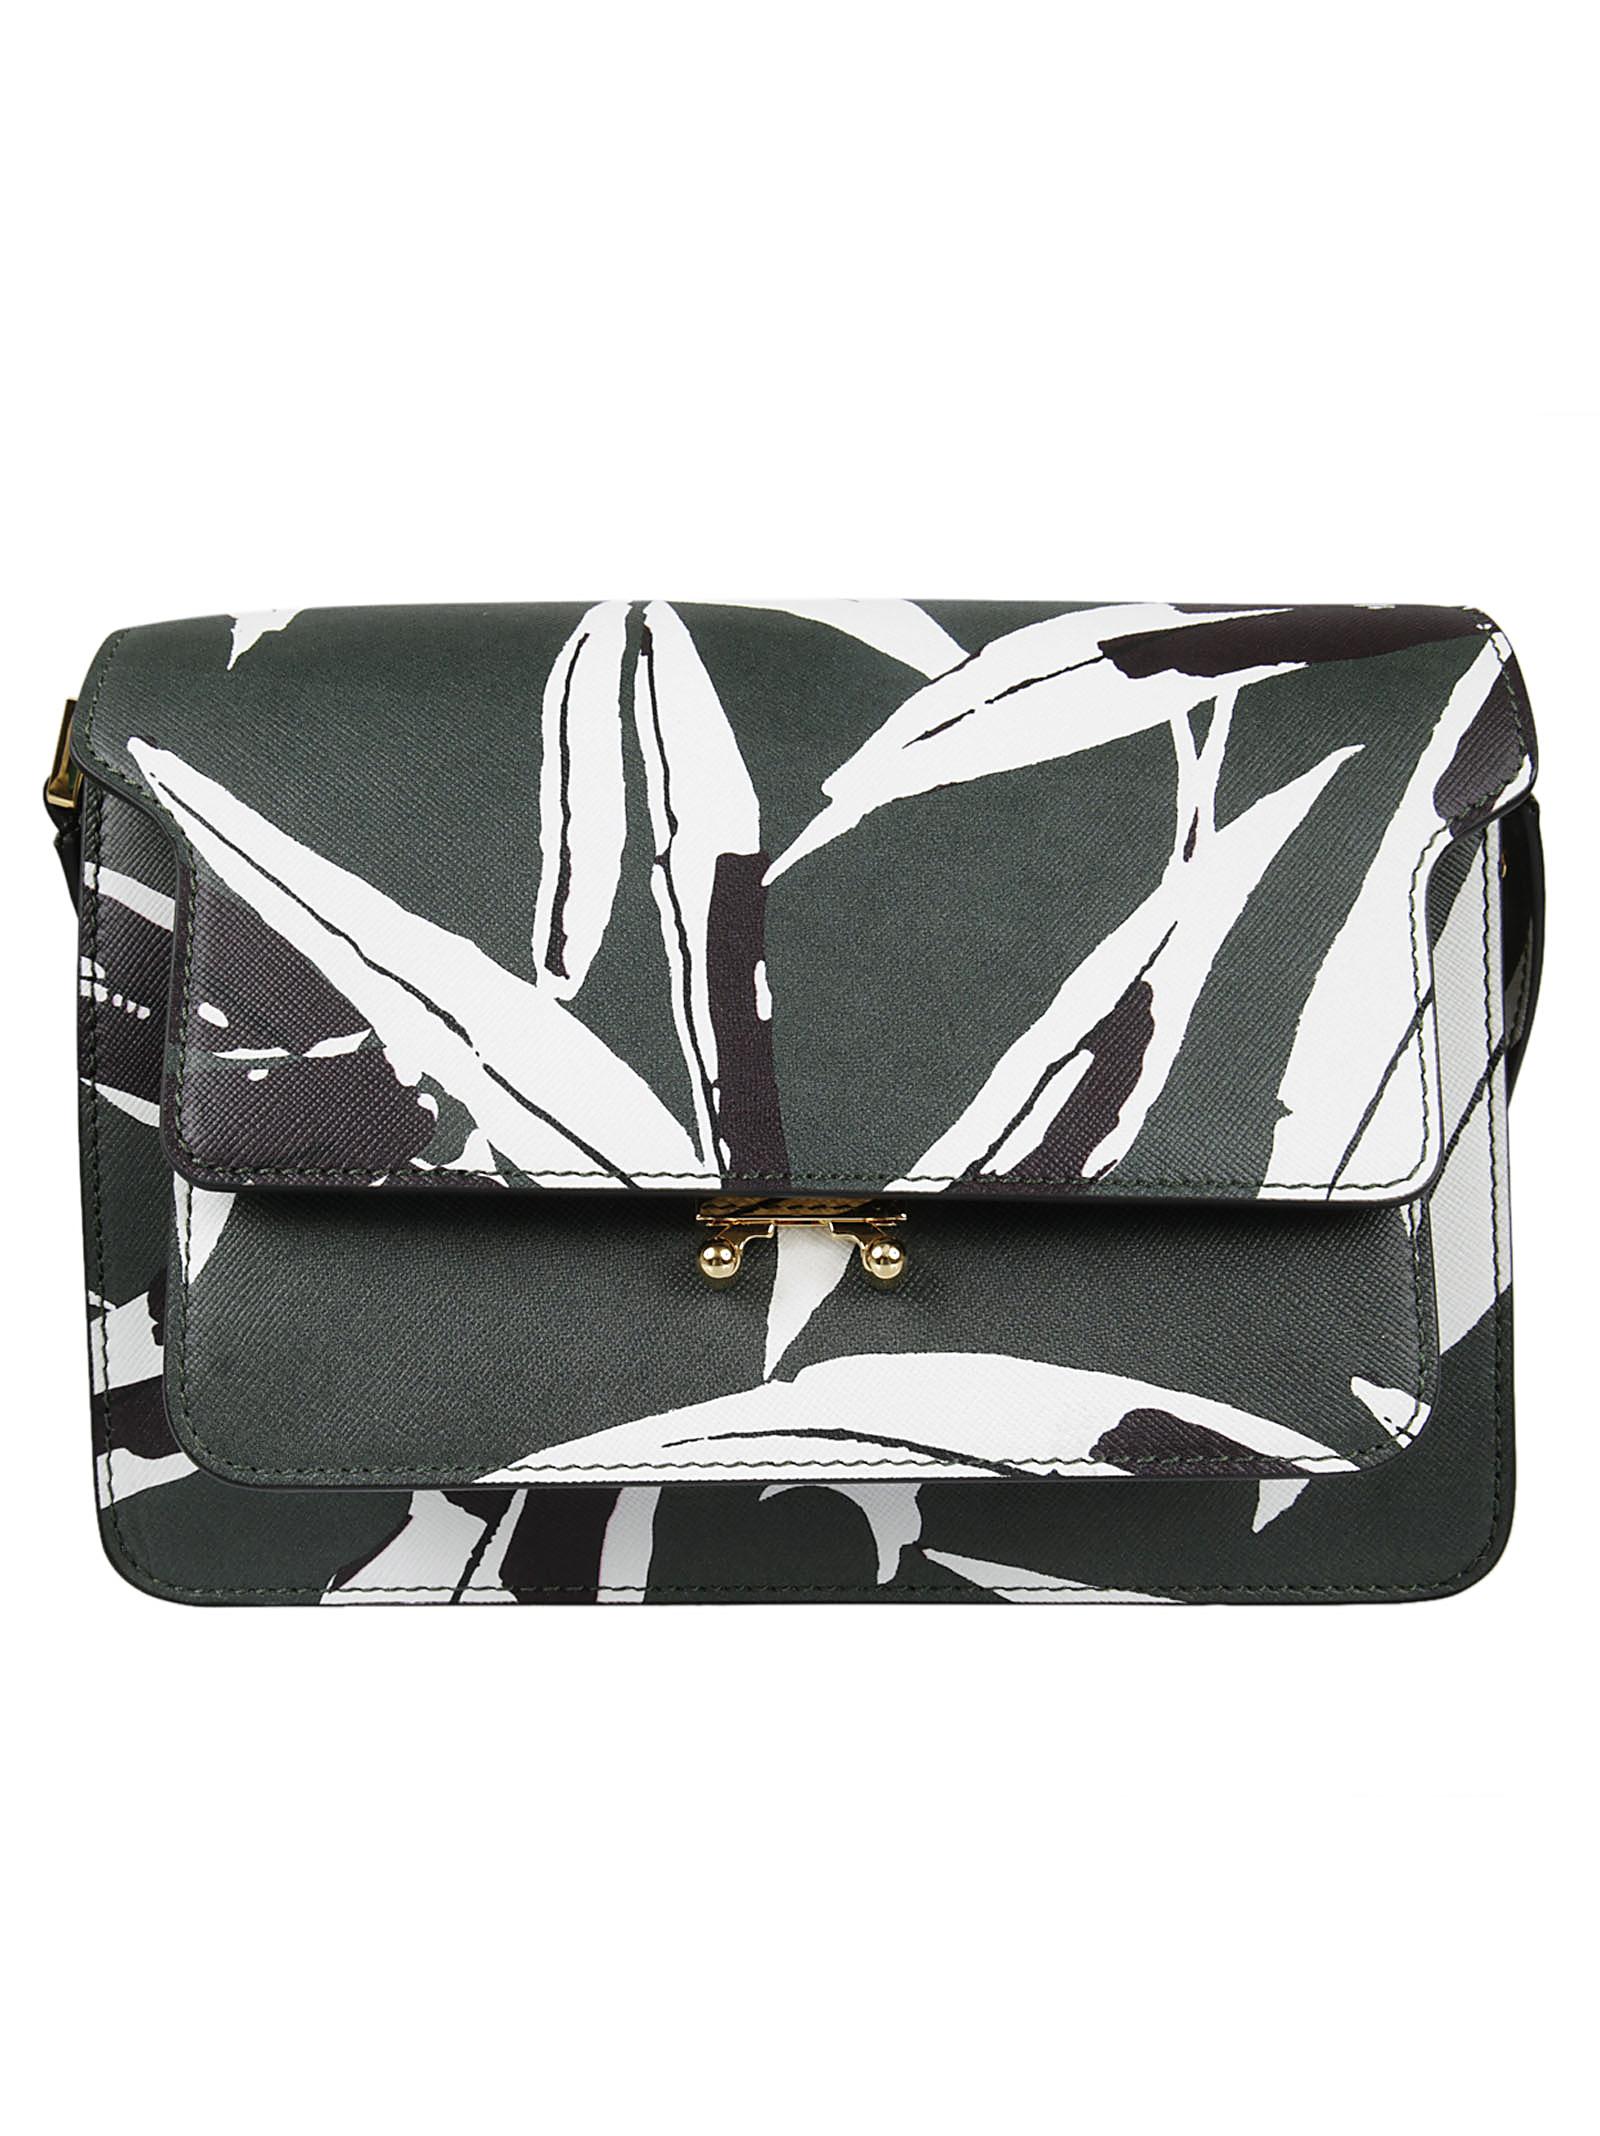 Marni Marni Floral Print Shoulder Bag